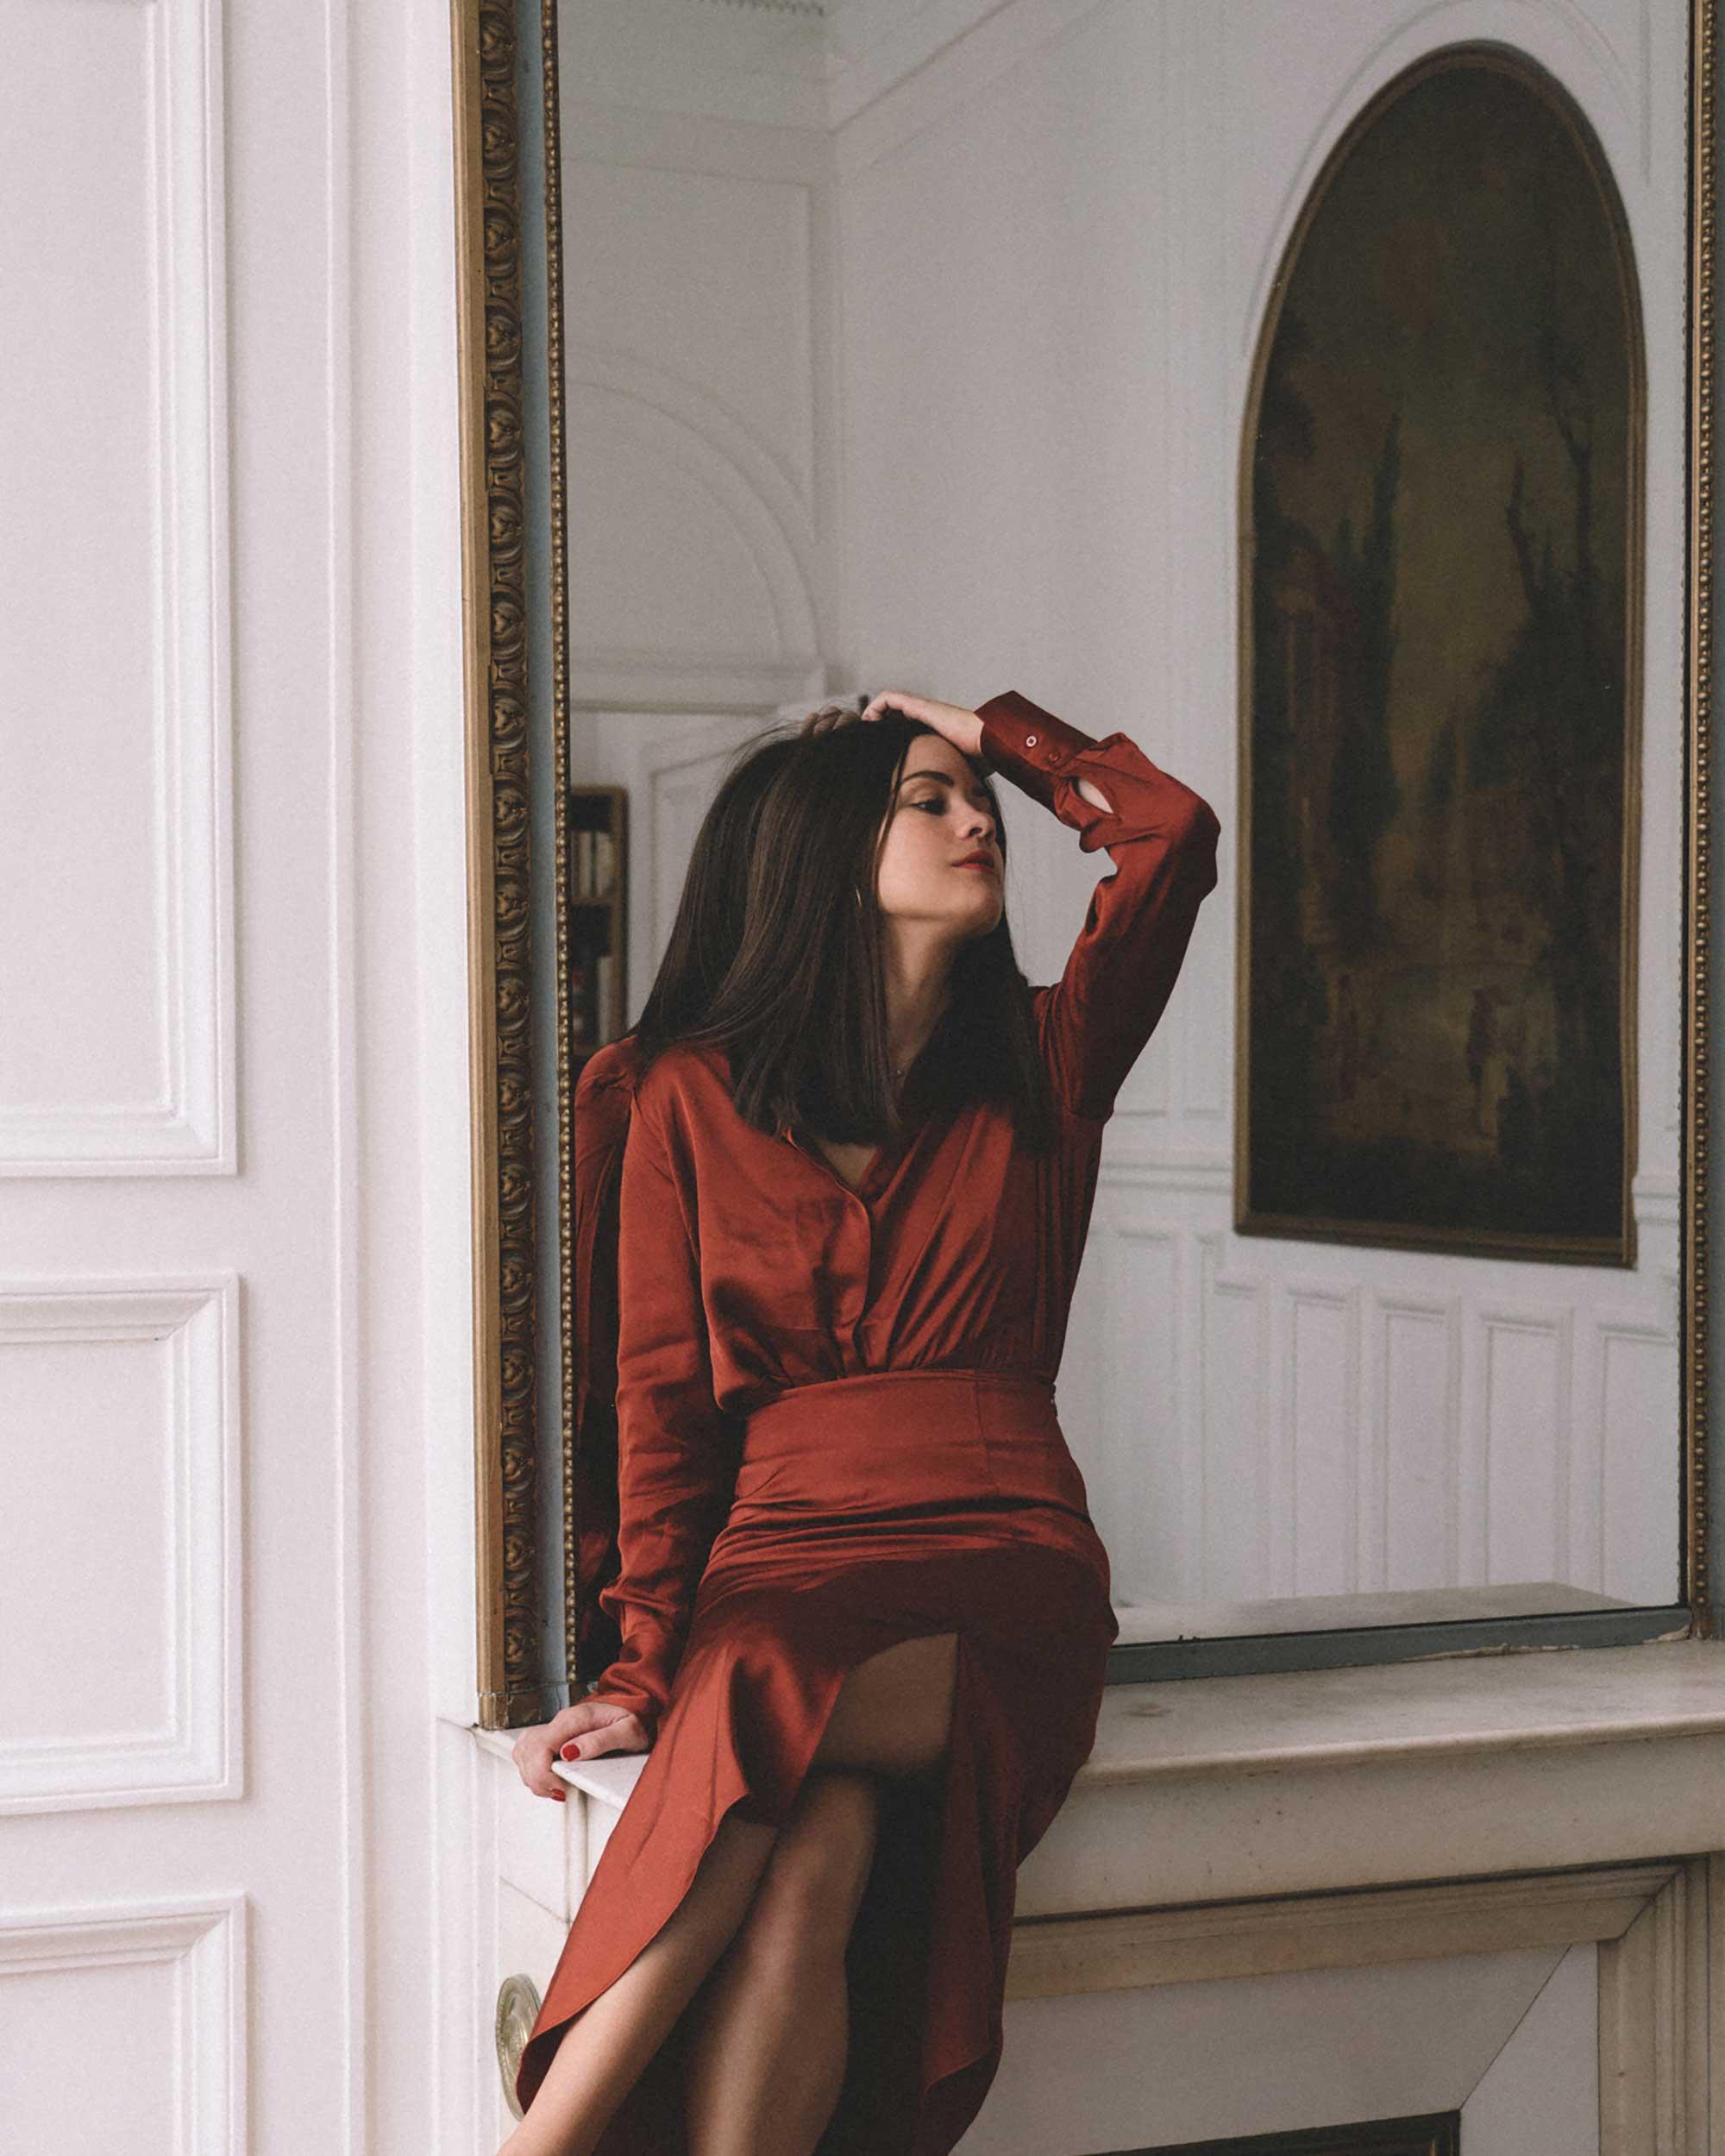 Button Up Satin Blouse, Asymmetric Slit Midi Skirt, Luxury Paris Apartment, Fall Outfit2.jpg